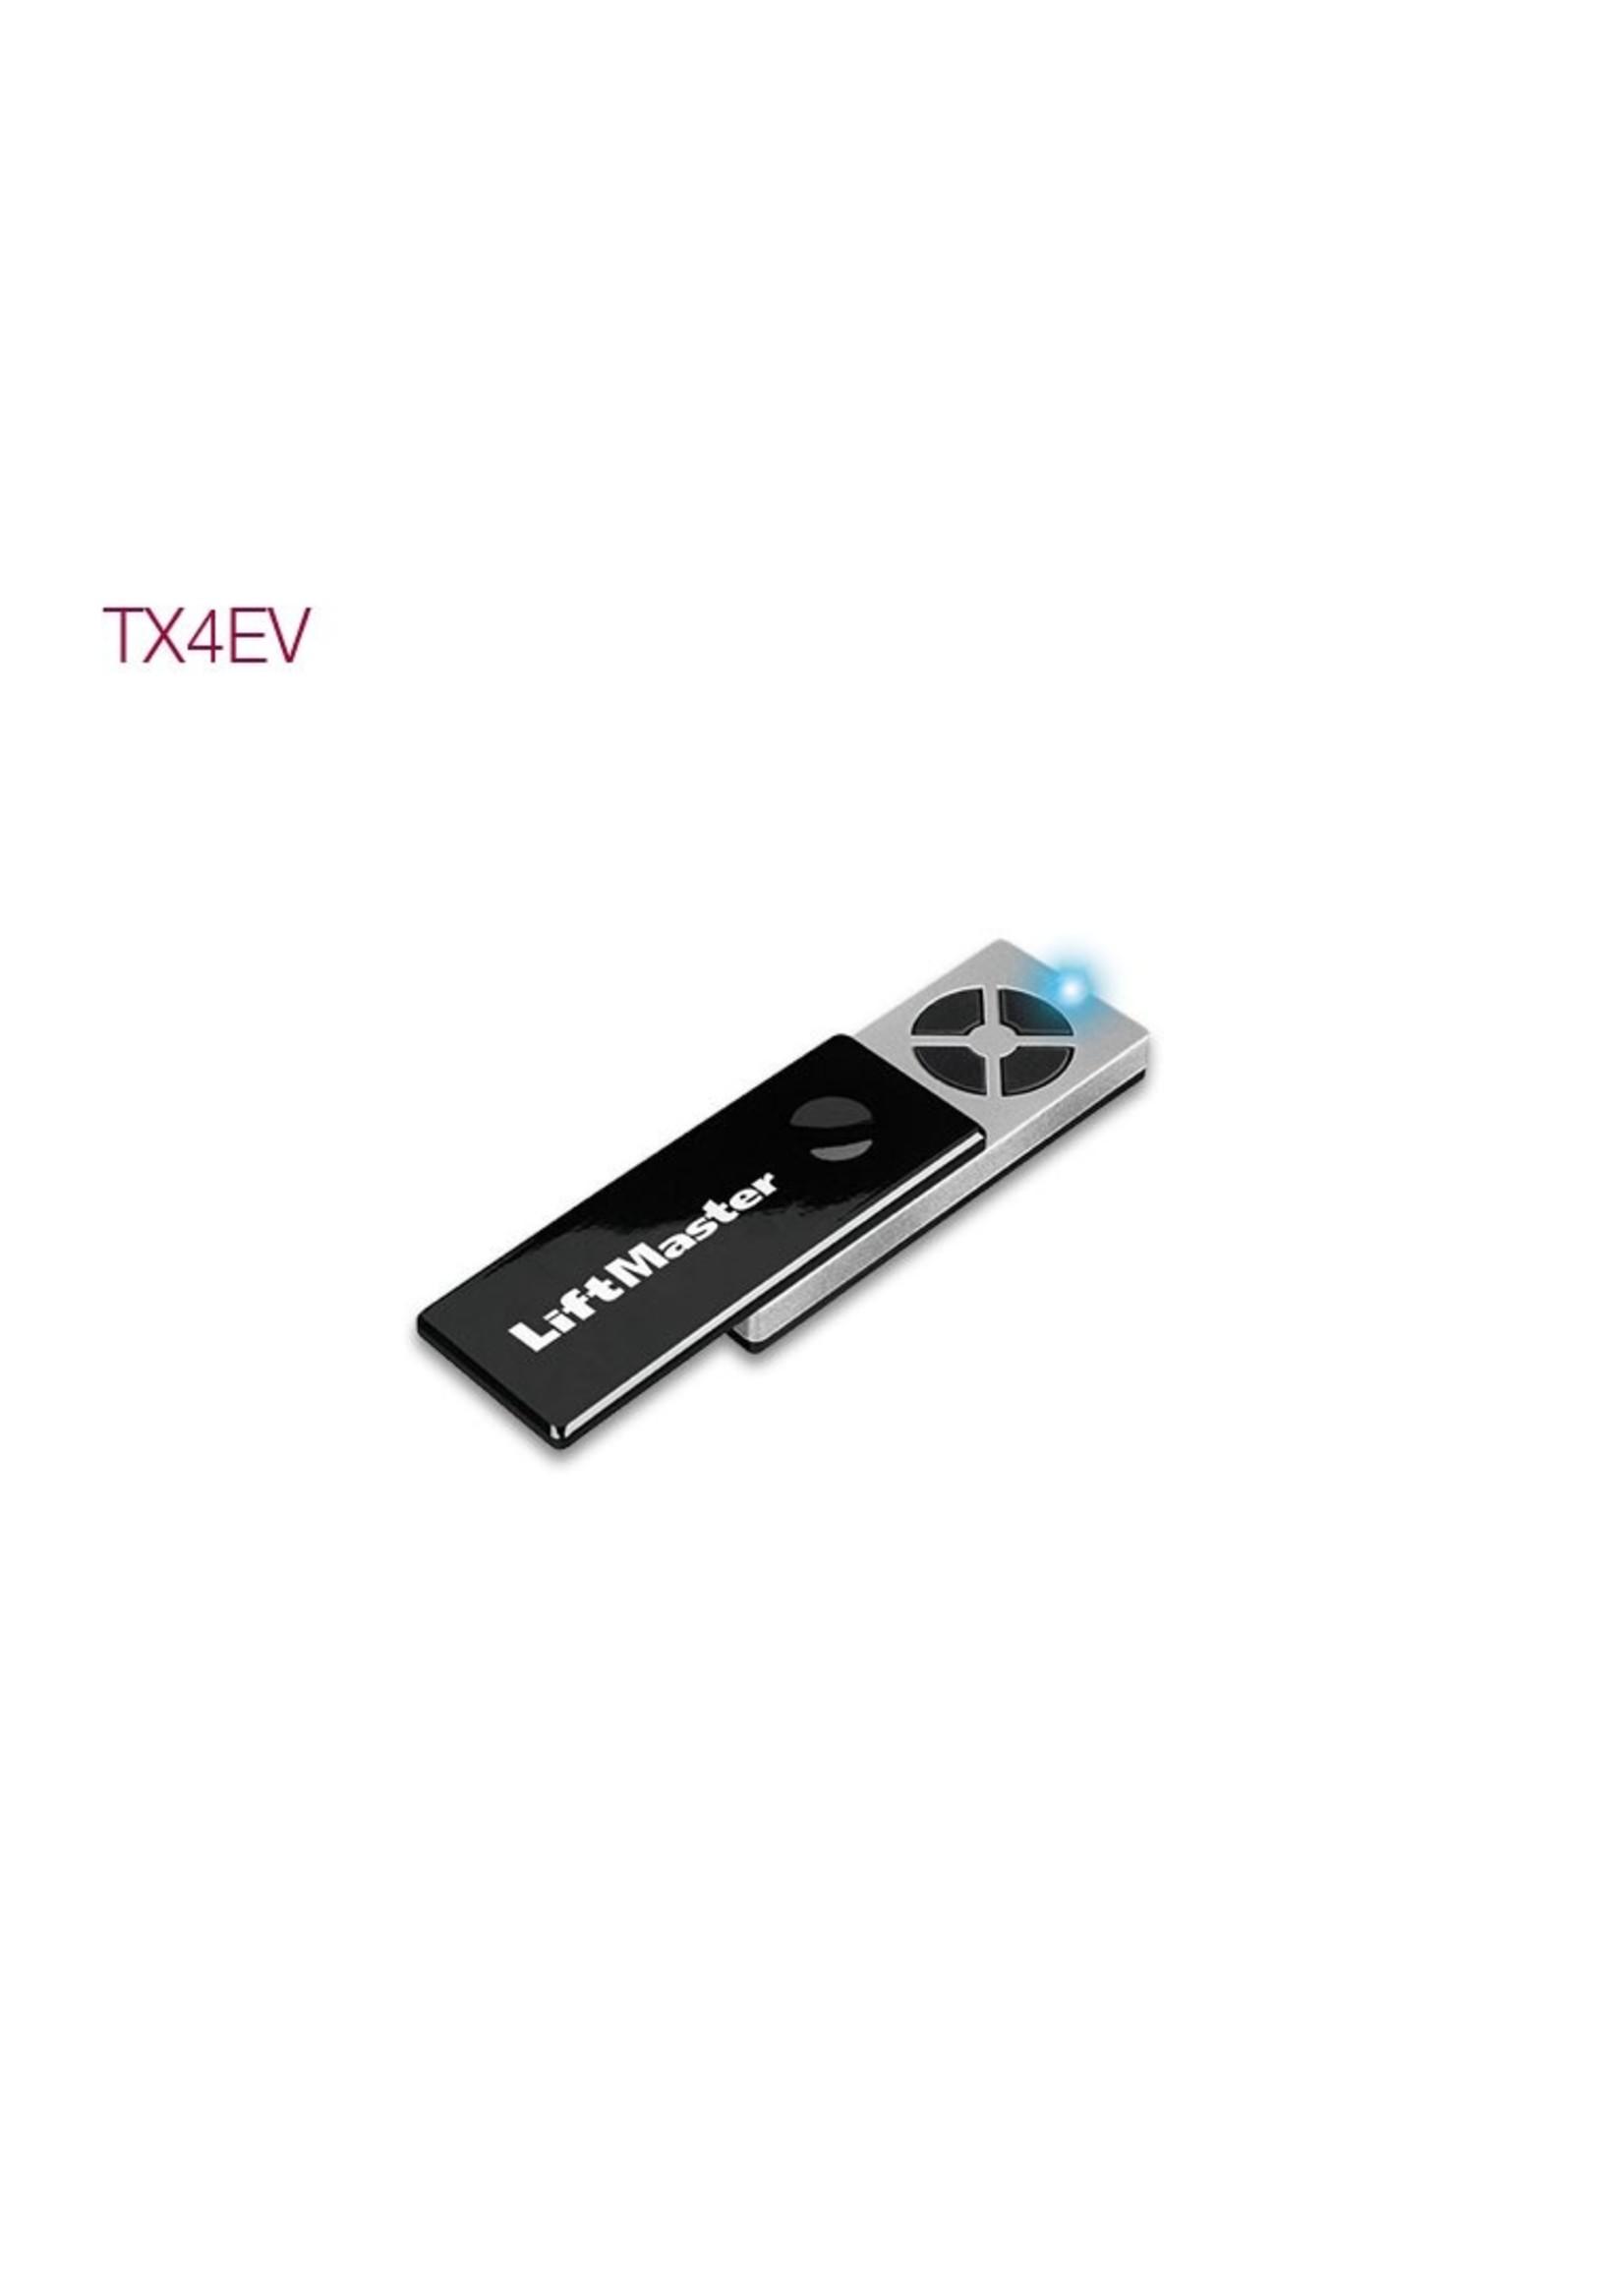 Liftmaster TX4EV Liftmaster 868Mhz handzender 4 kanalen